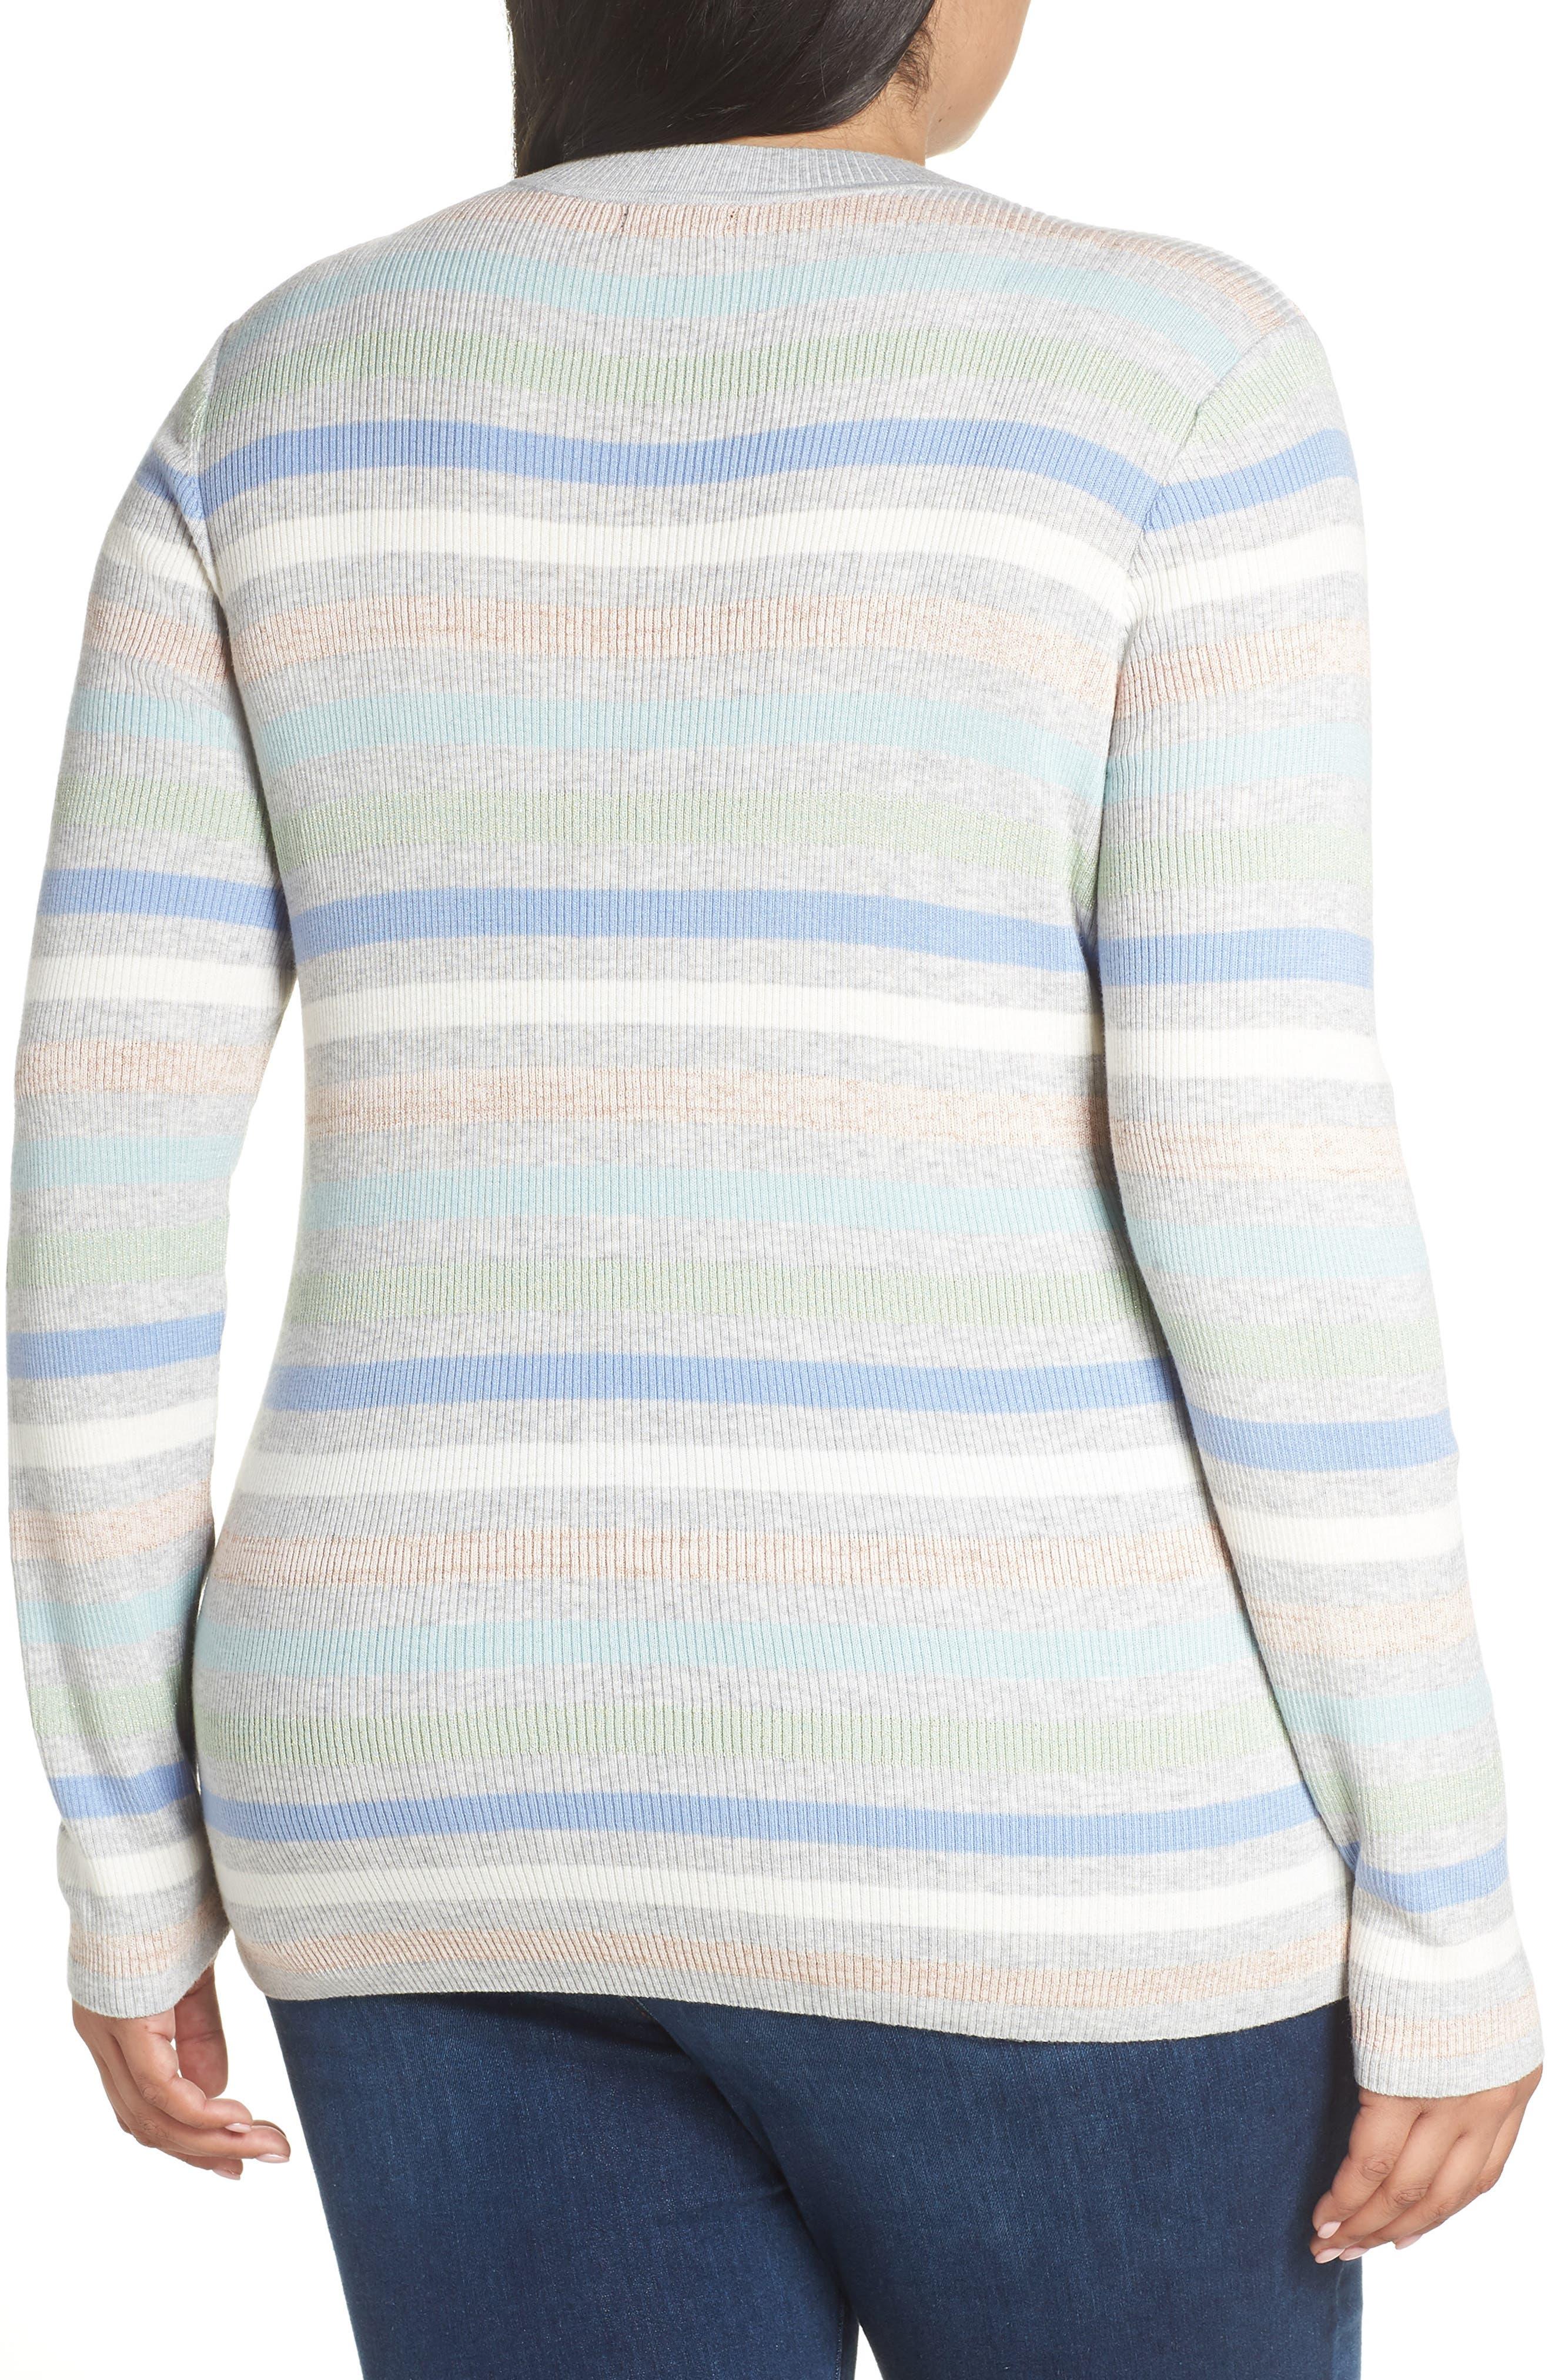 x Atlantic-Pacific Shimmer Stripe Sweater,                             Alternate thumbnail 2, color,                             GREY MULTI STRIPE